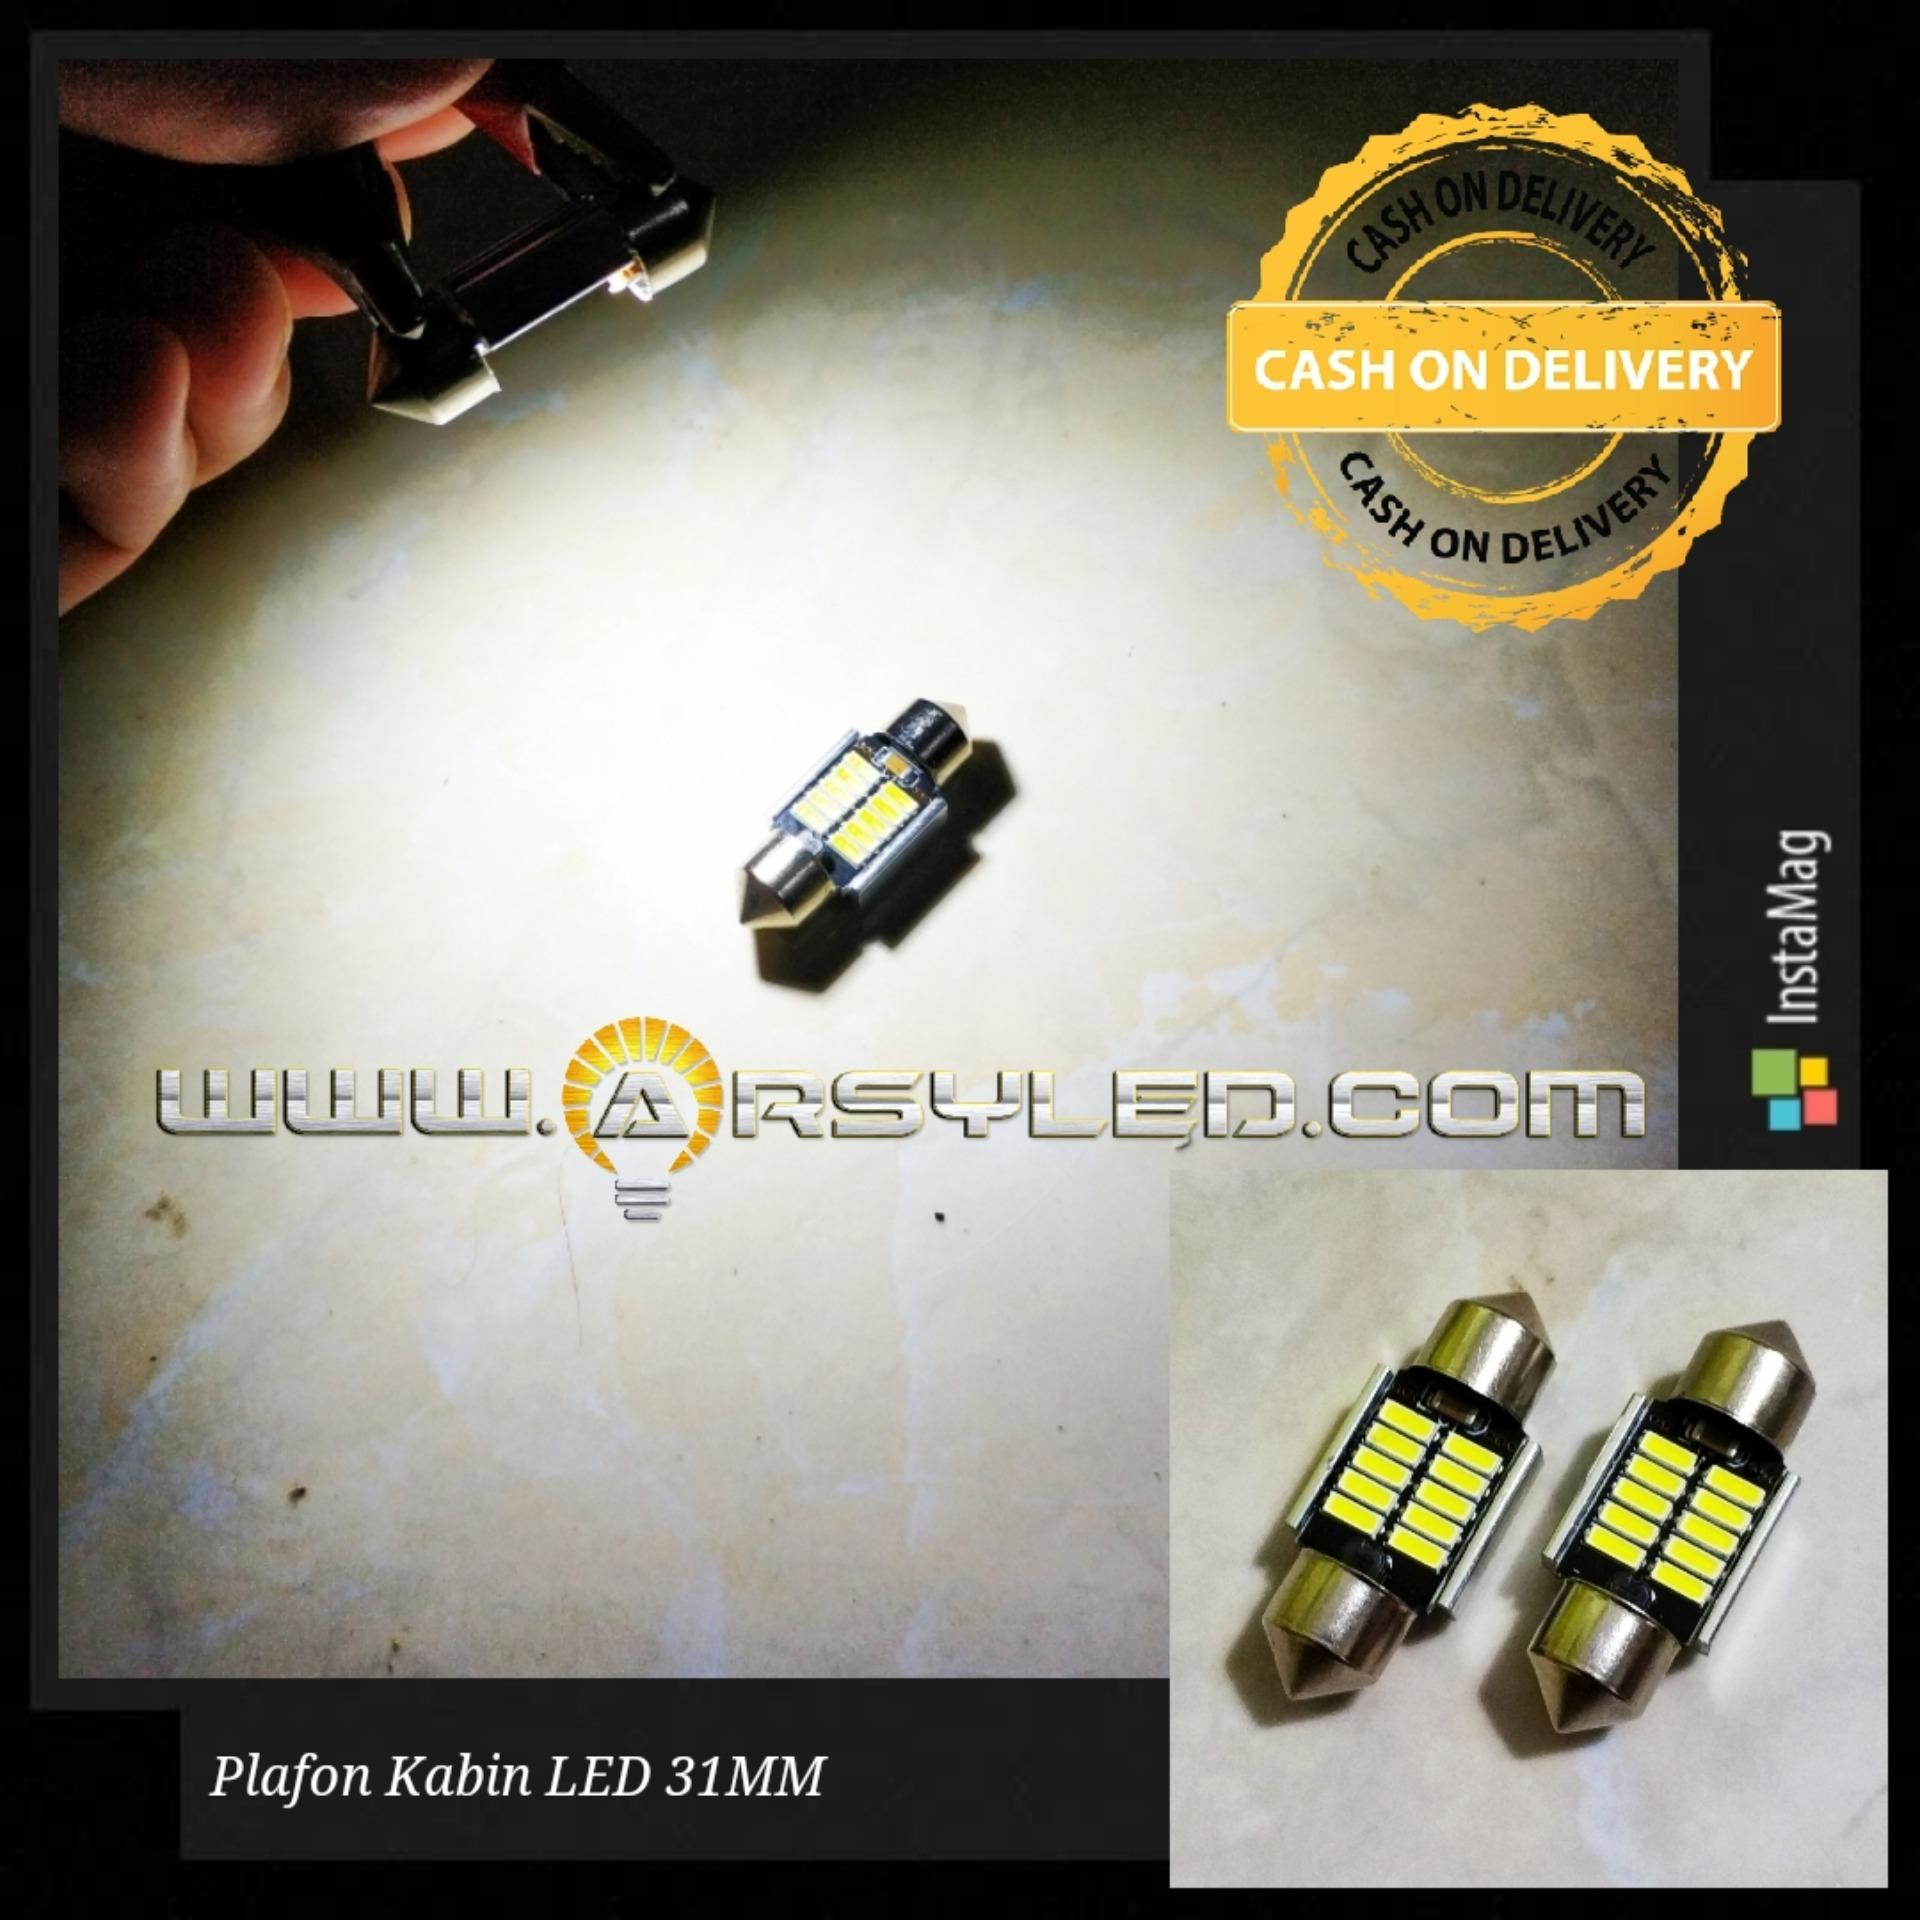 2 Biji Lampu Kabin Plafon Avanza Xenia Sigra calya alya agya Festoon CANBUS 31 mm Gen2 Arsystore - Putih